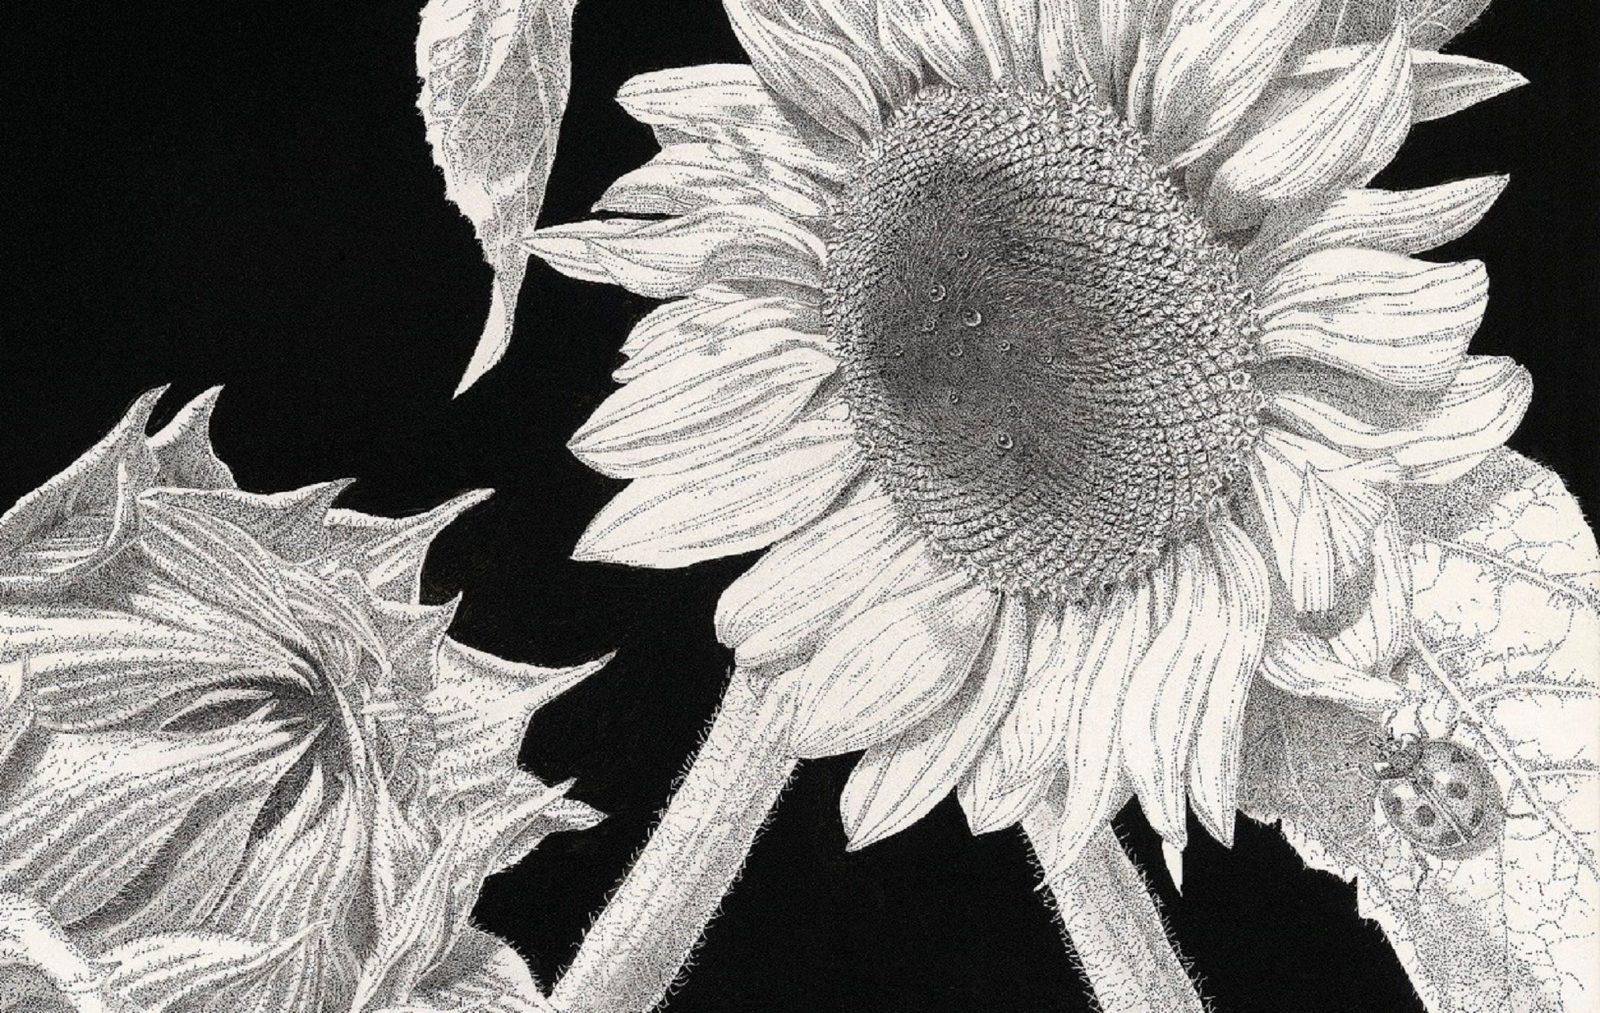 Stippled ink on Clayboard